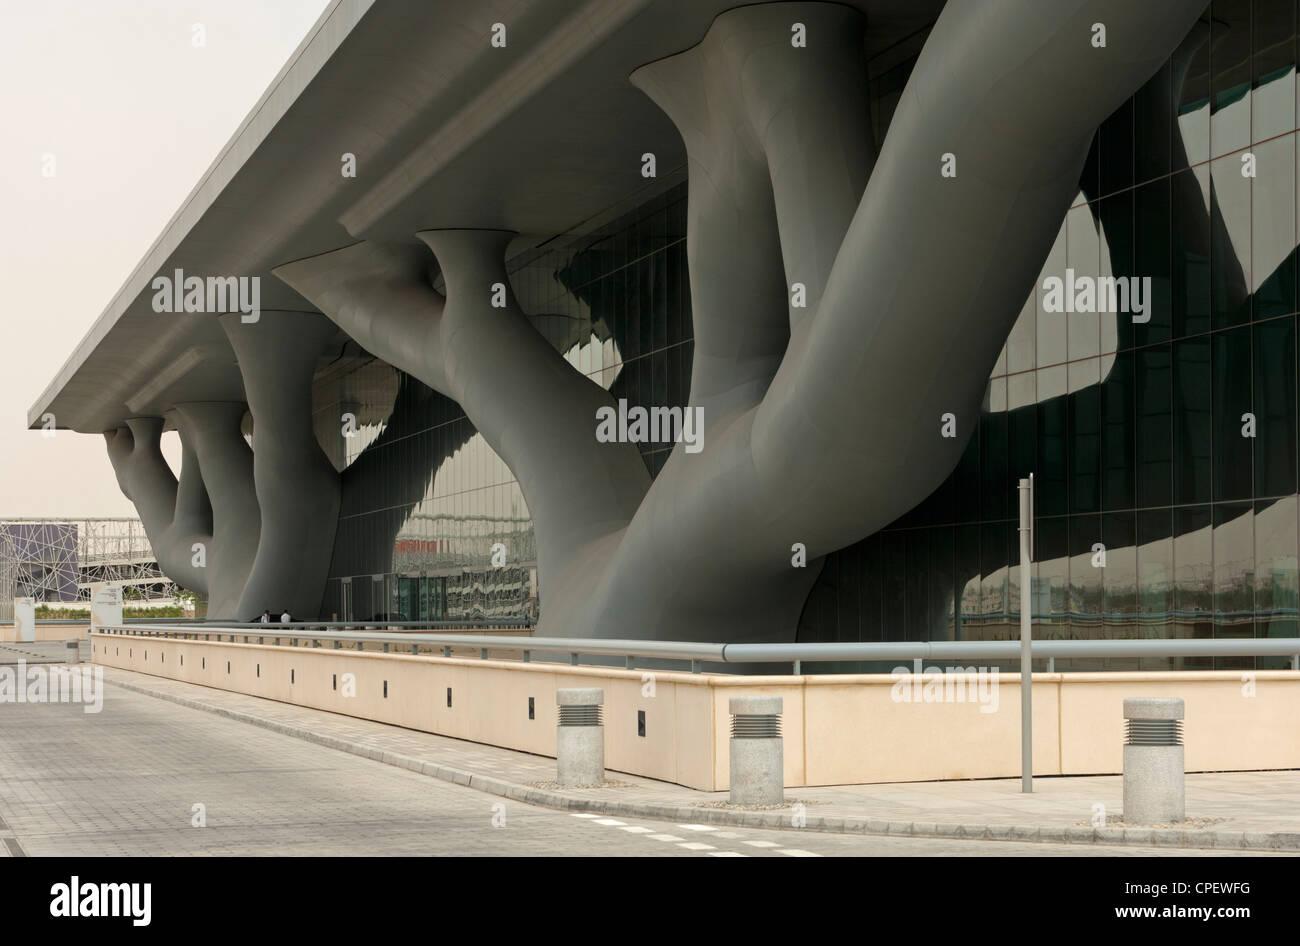 Qatar National Convention Center, QNCC, con una espectacular fachada semejando dos árboles entrelazados Sidra, Imagen De Stock